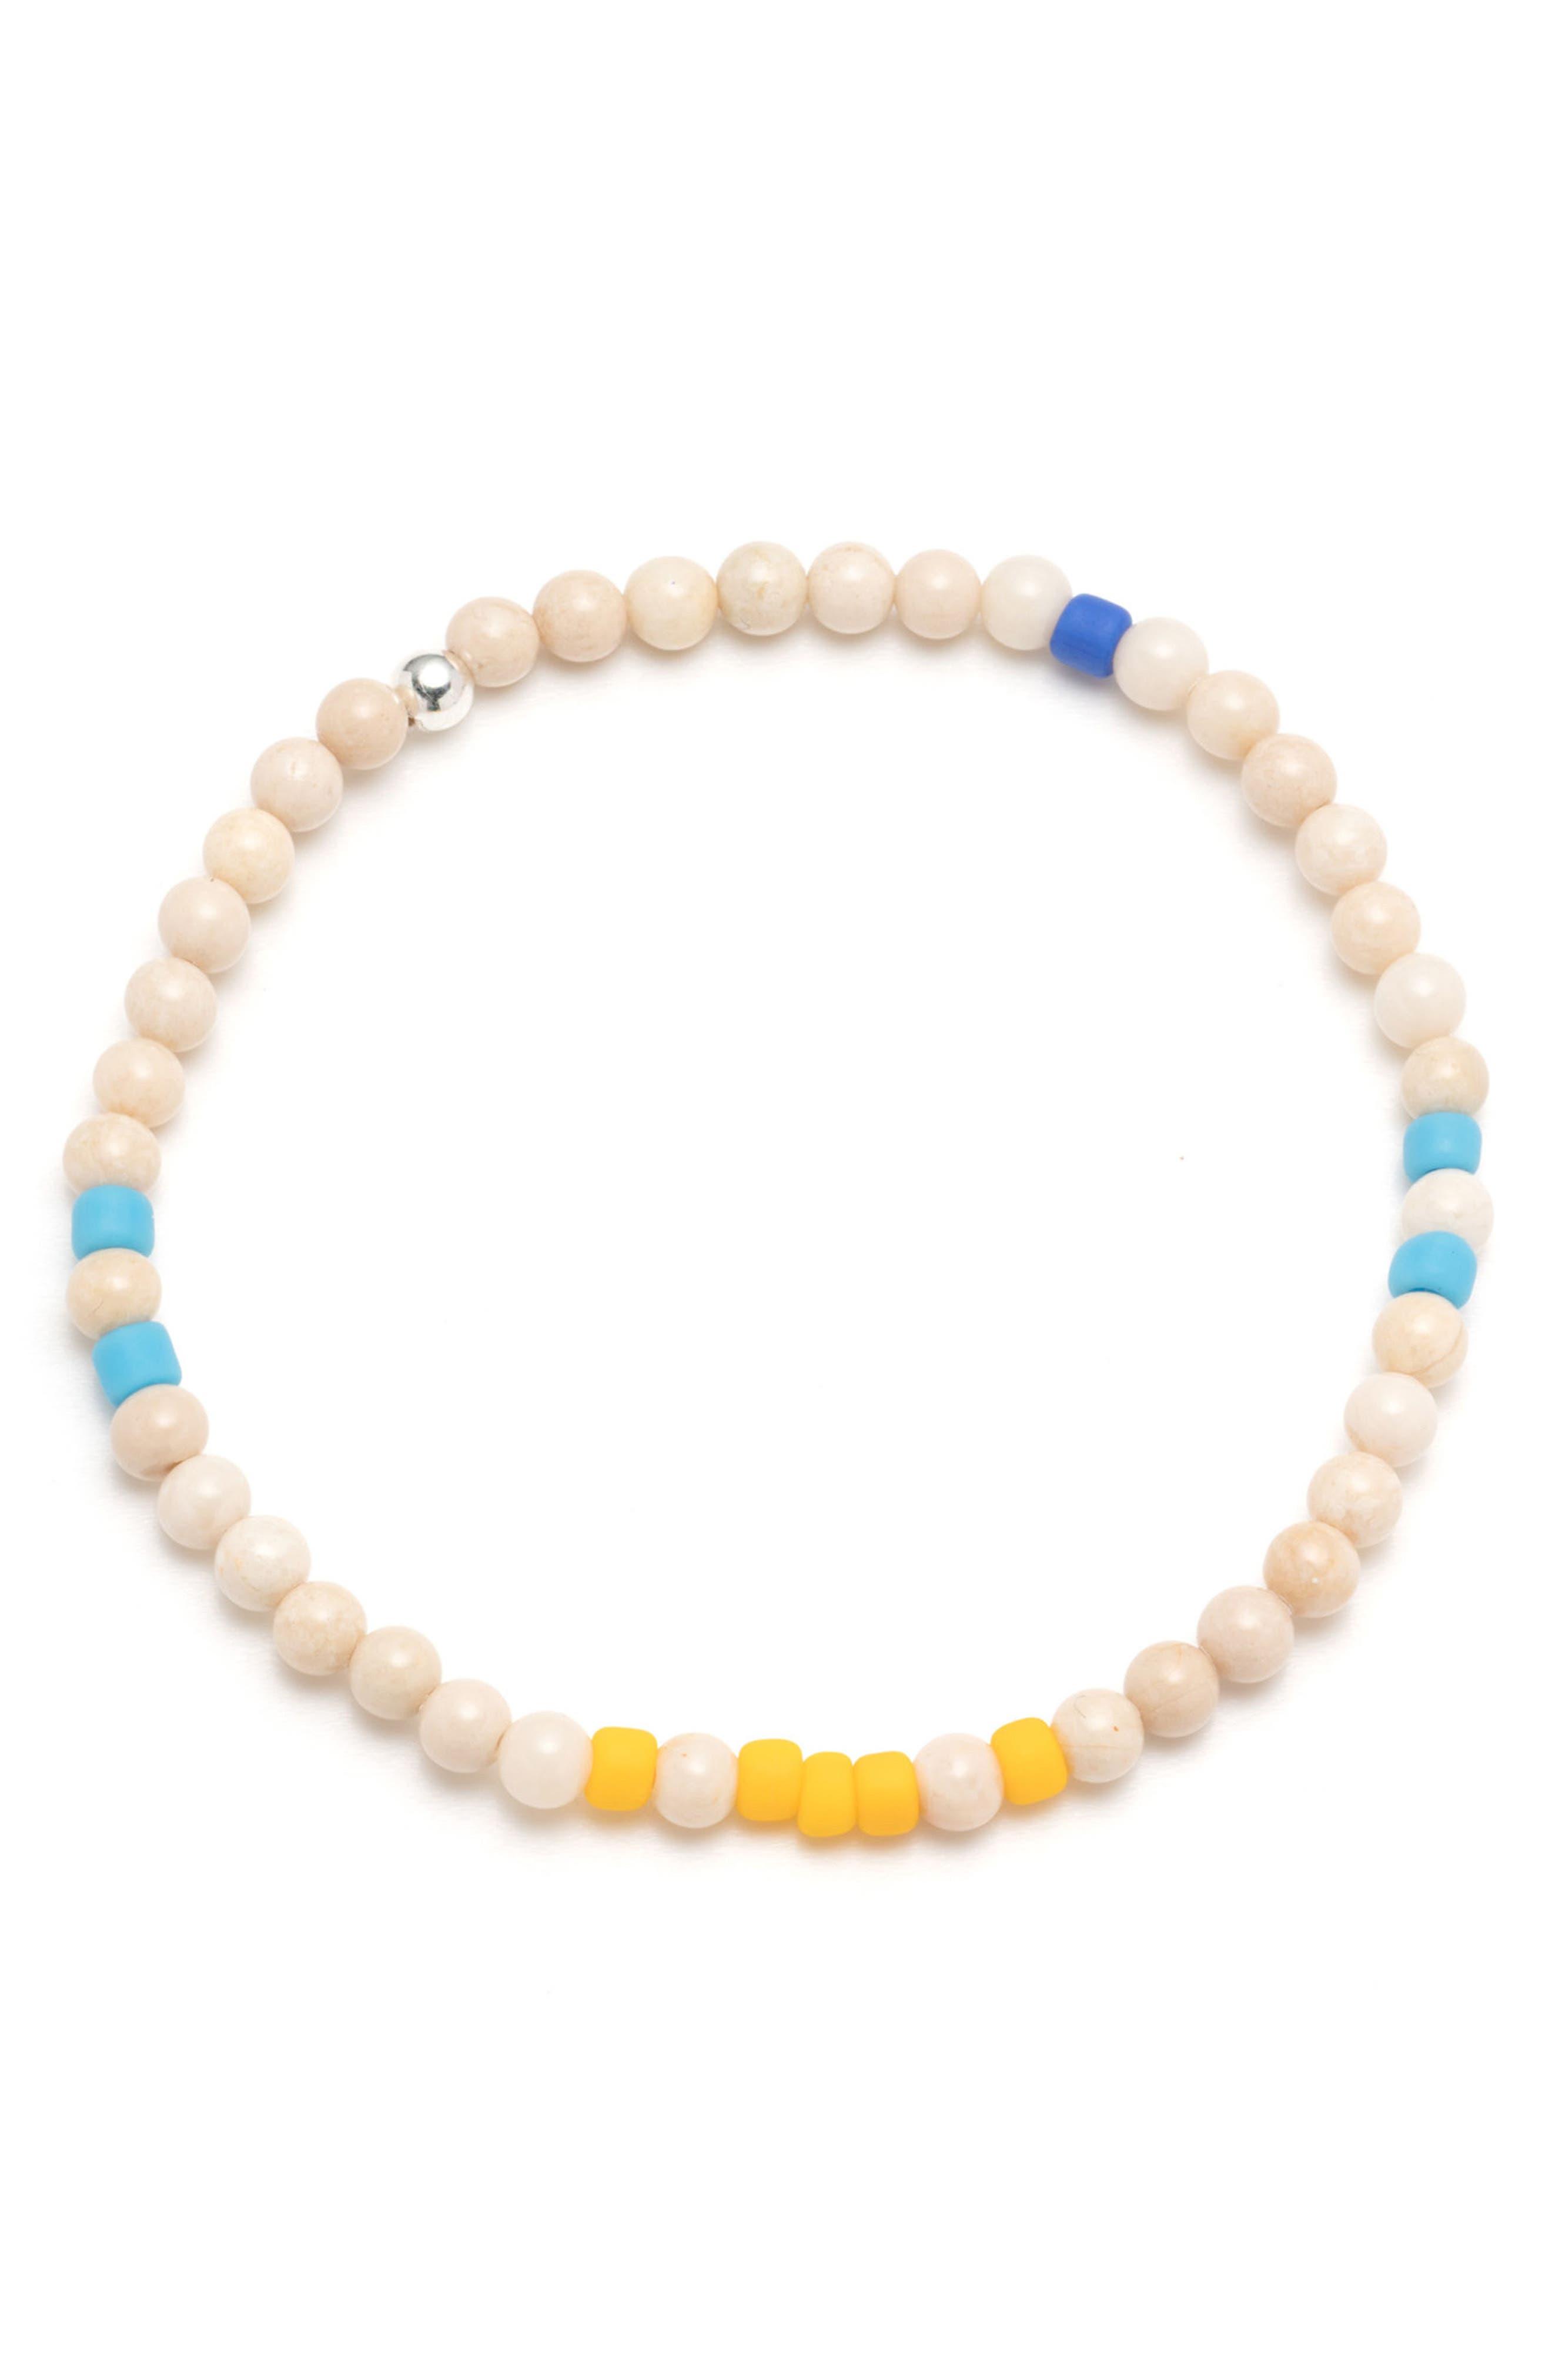 Irie Morse Bracelet,                             Main thumbnail 1, color,                             Blue/ Yellow/ White